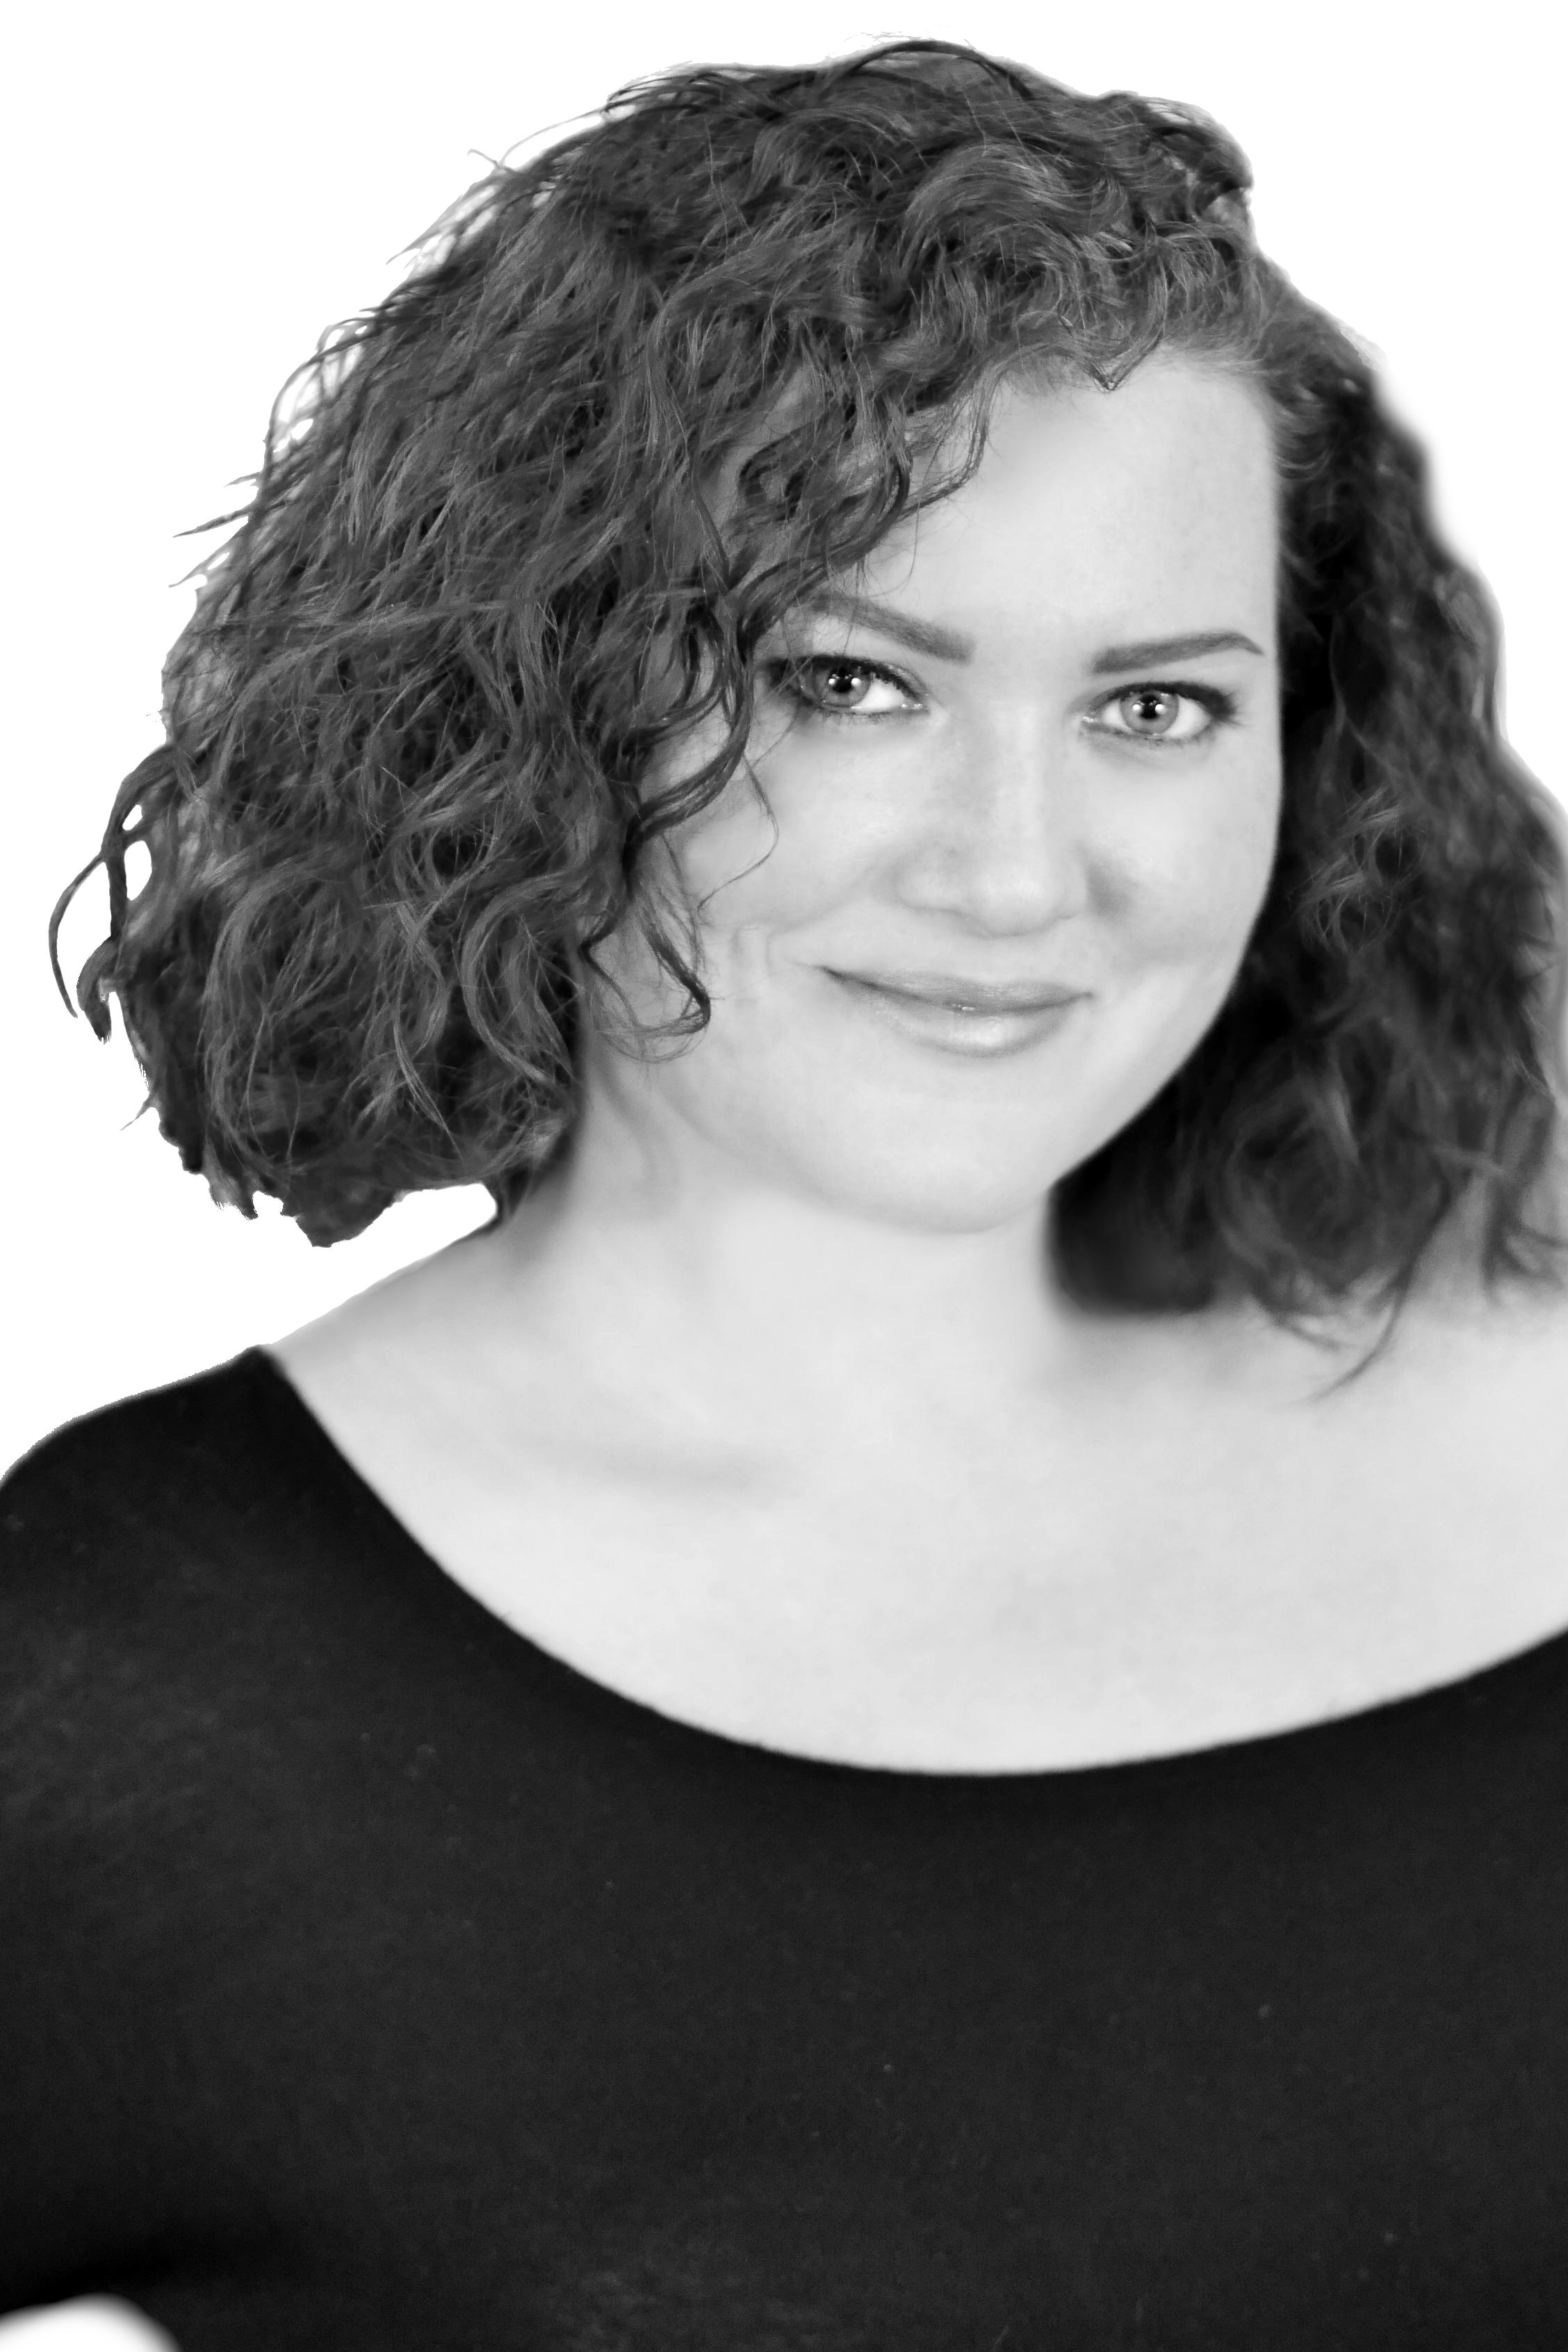 Julie Anne Bermel